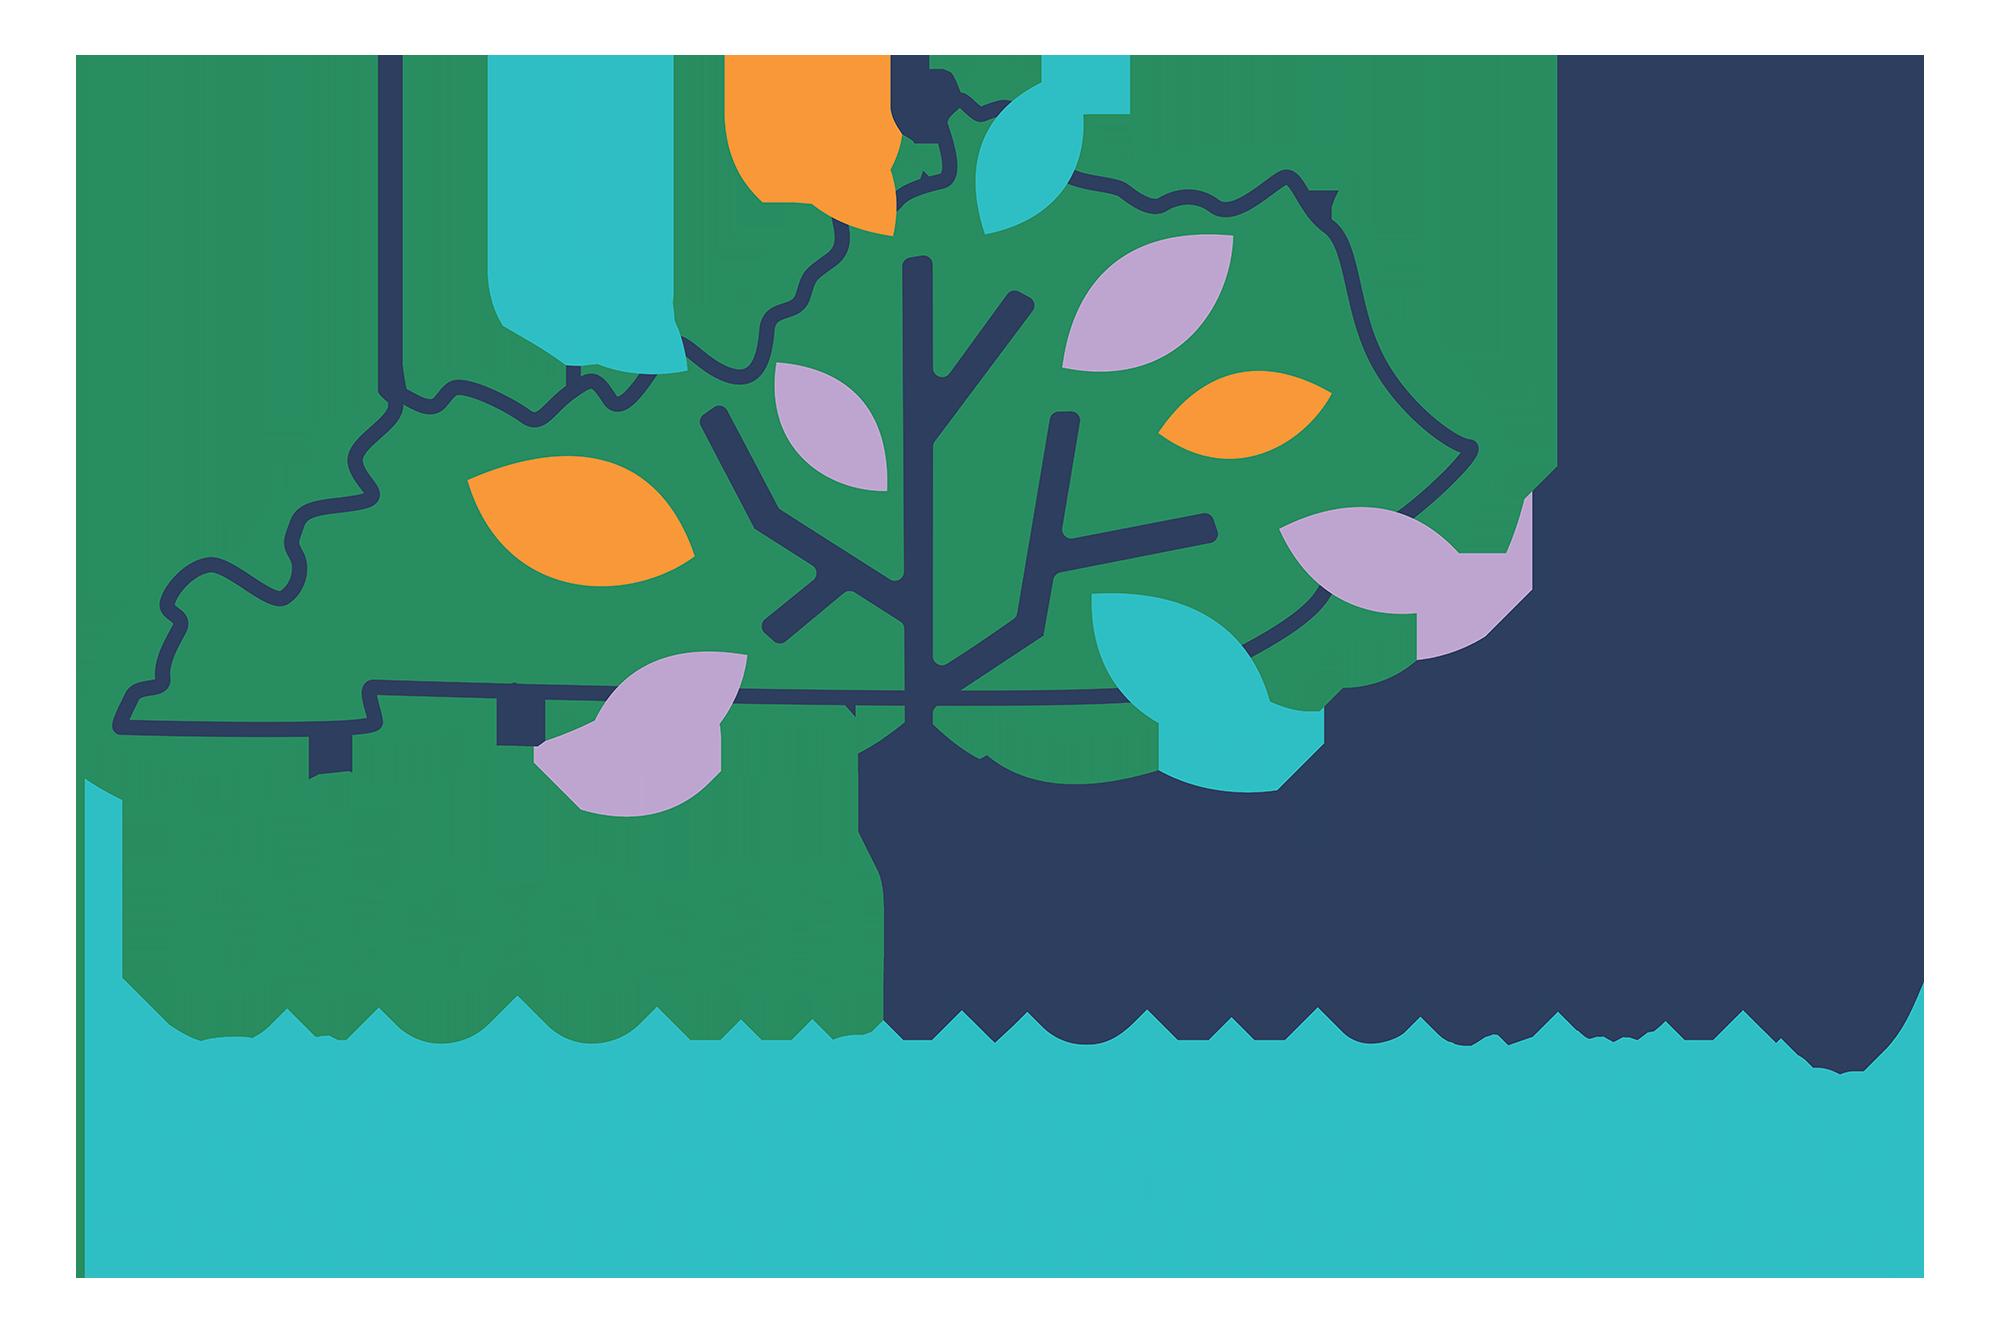 Bloom logo tagline (transparentbg)